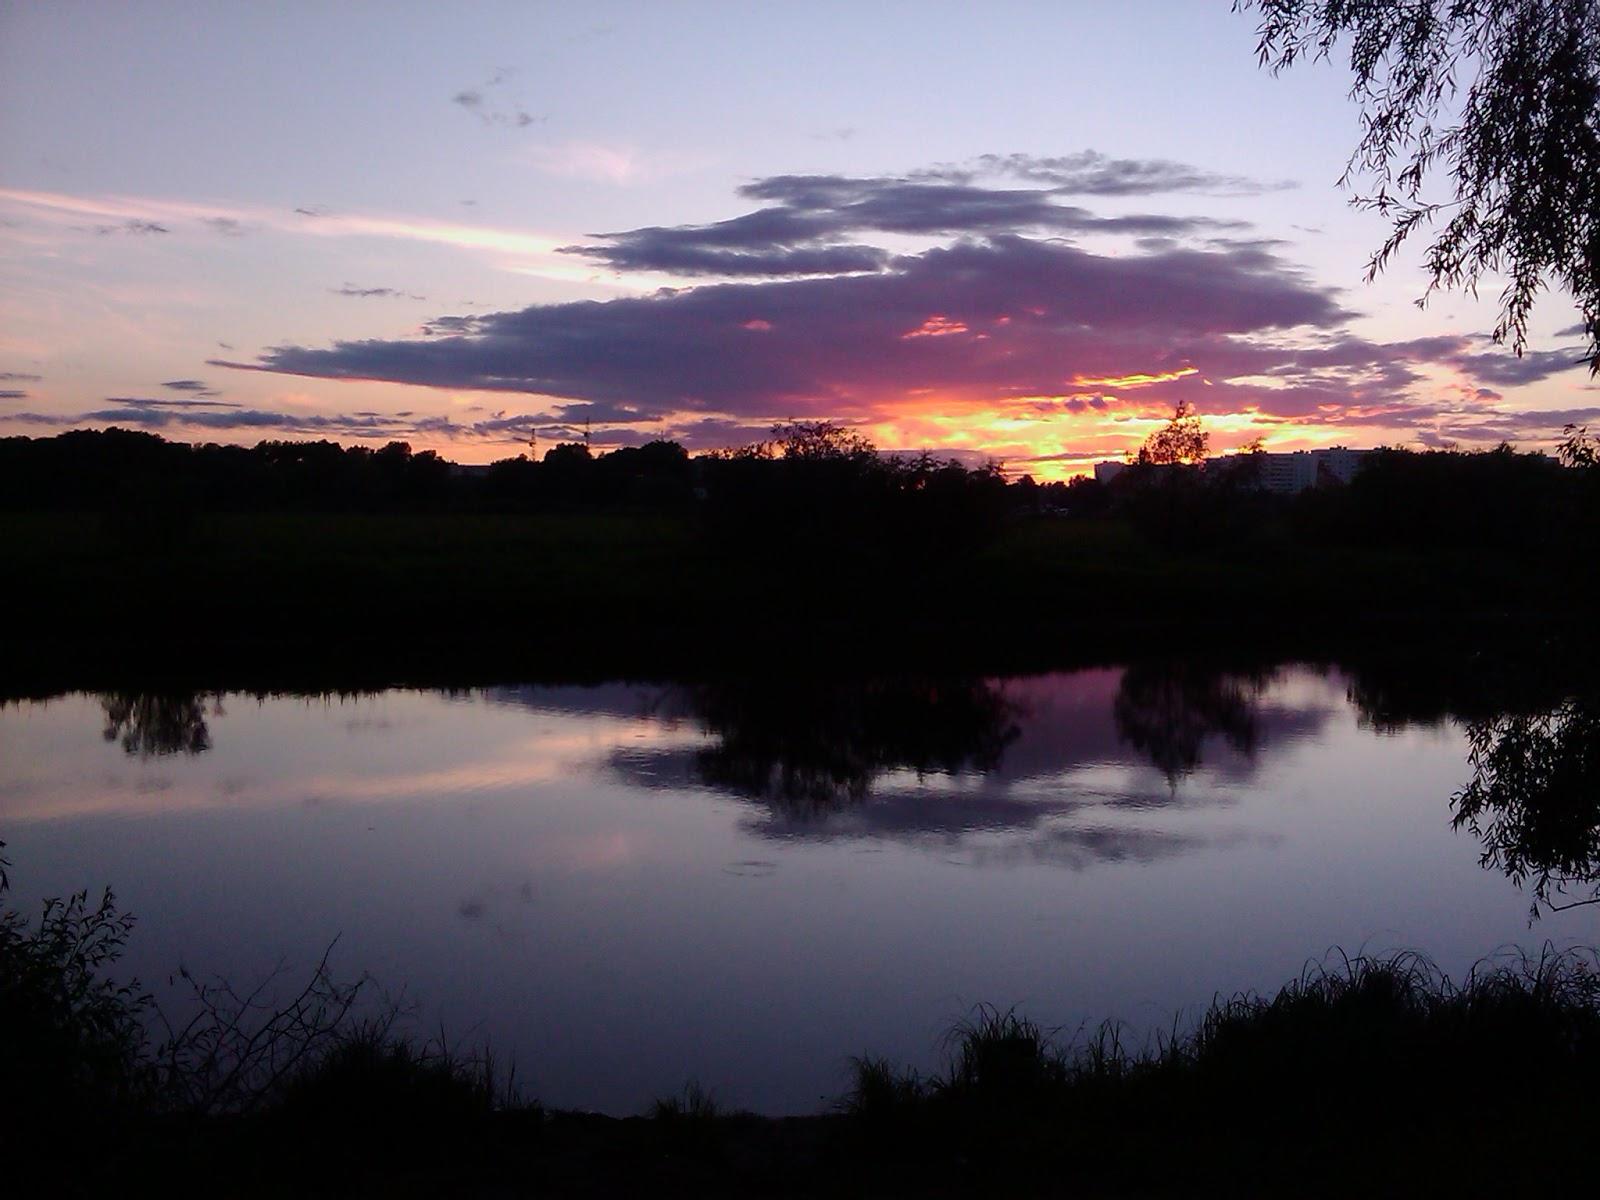 Красивые краски вечернего заката